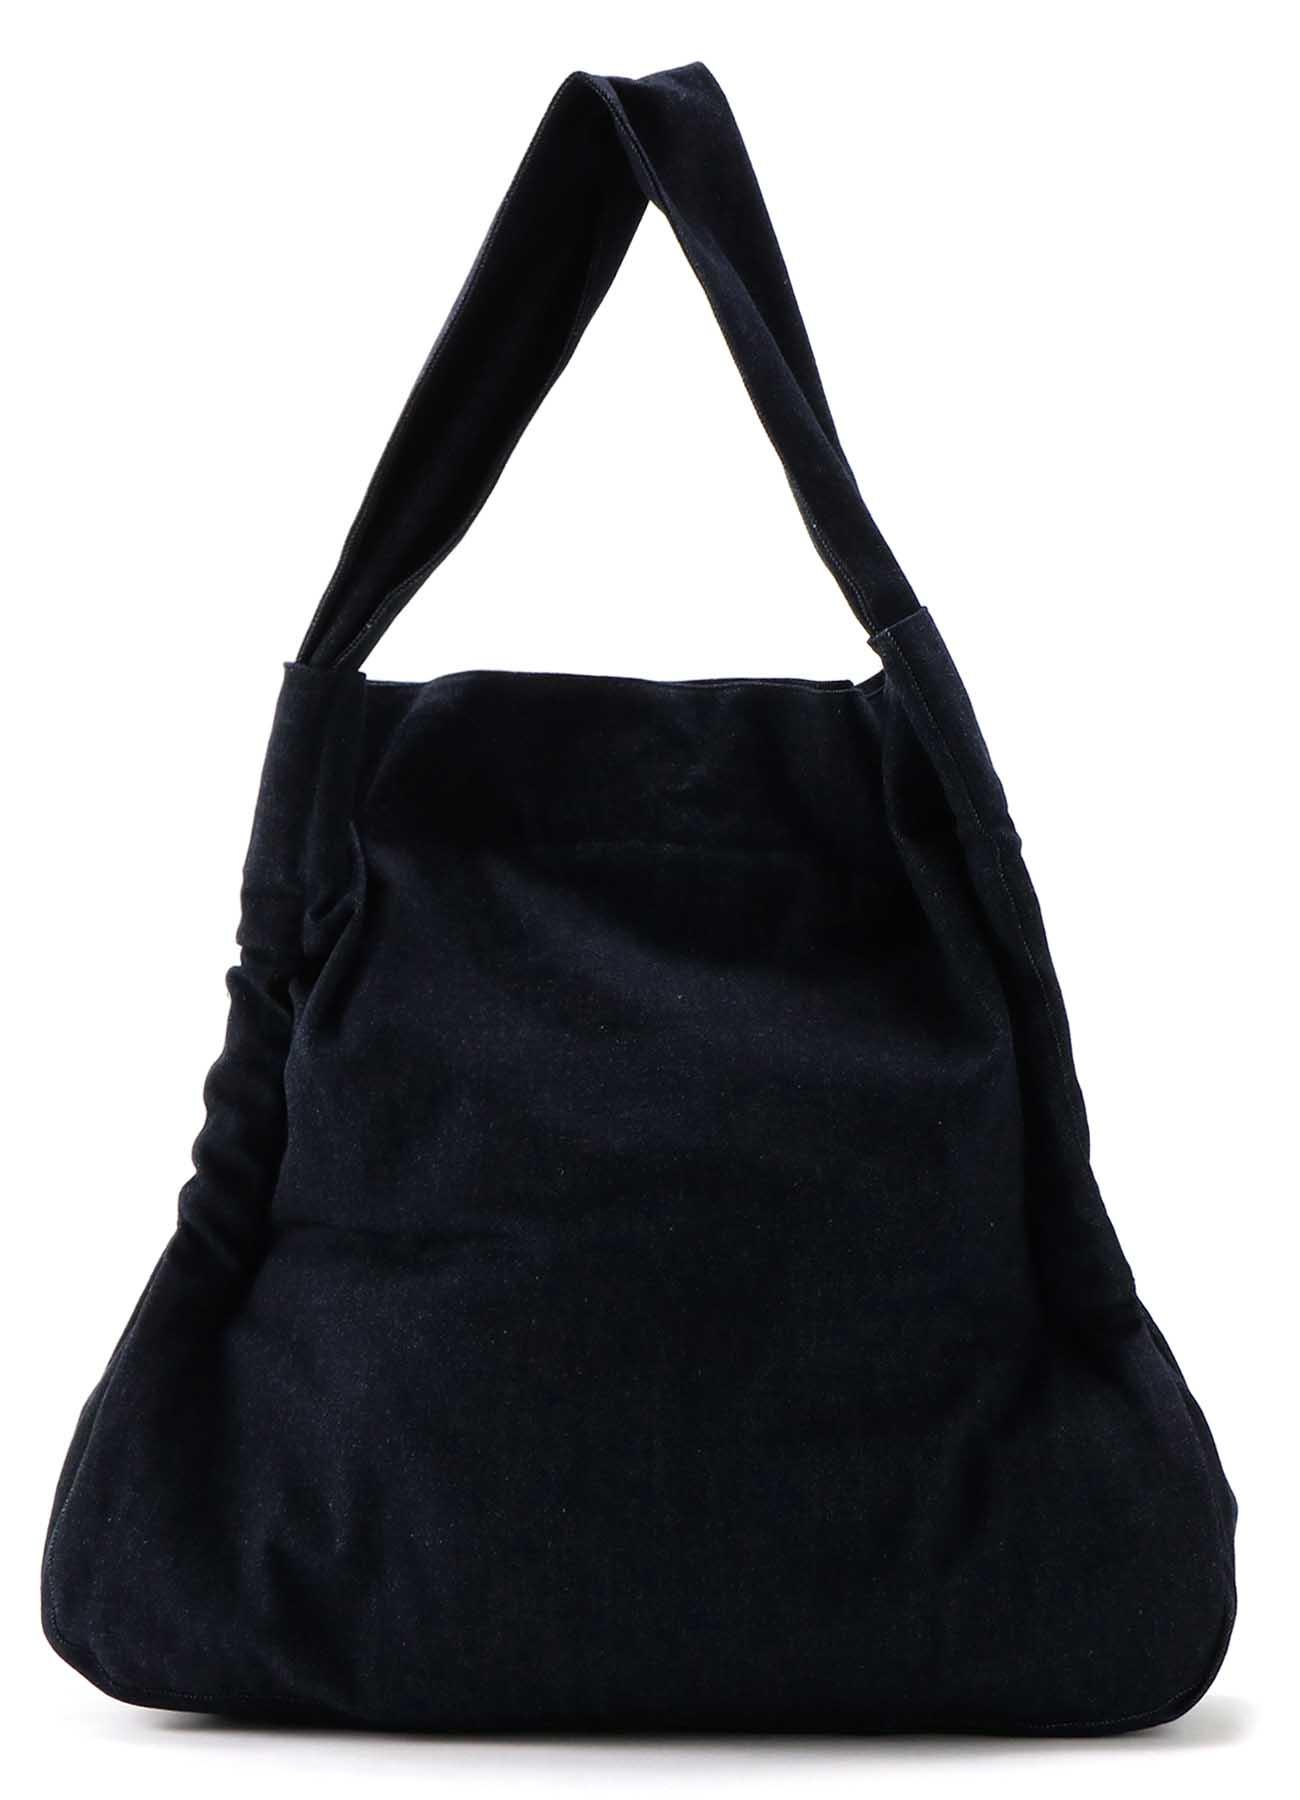 10oz DENIM GATHER BAG